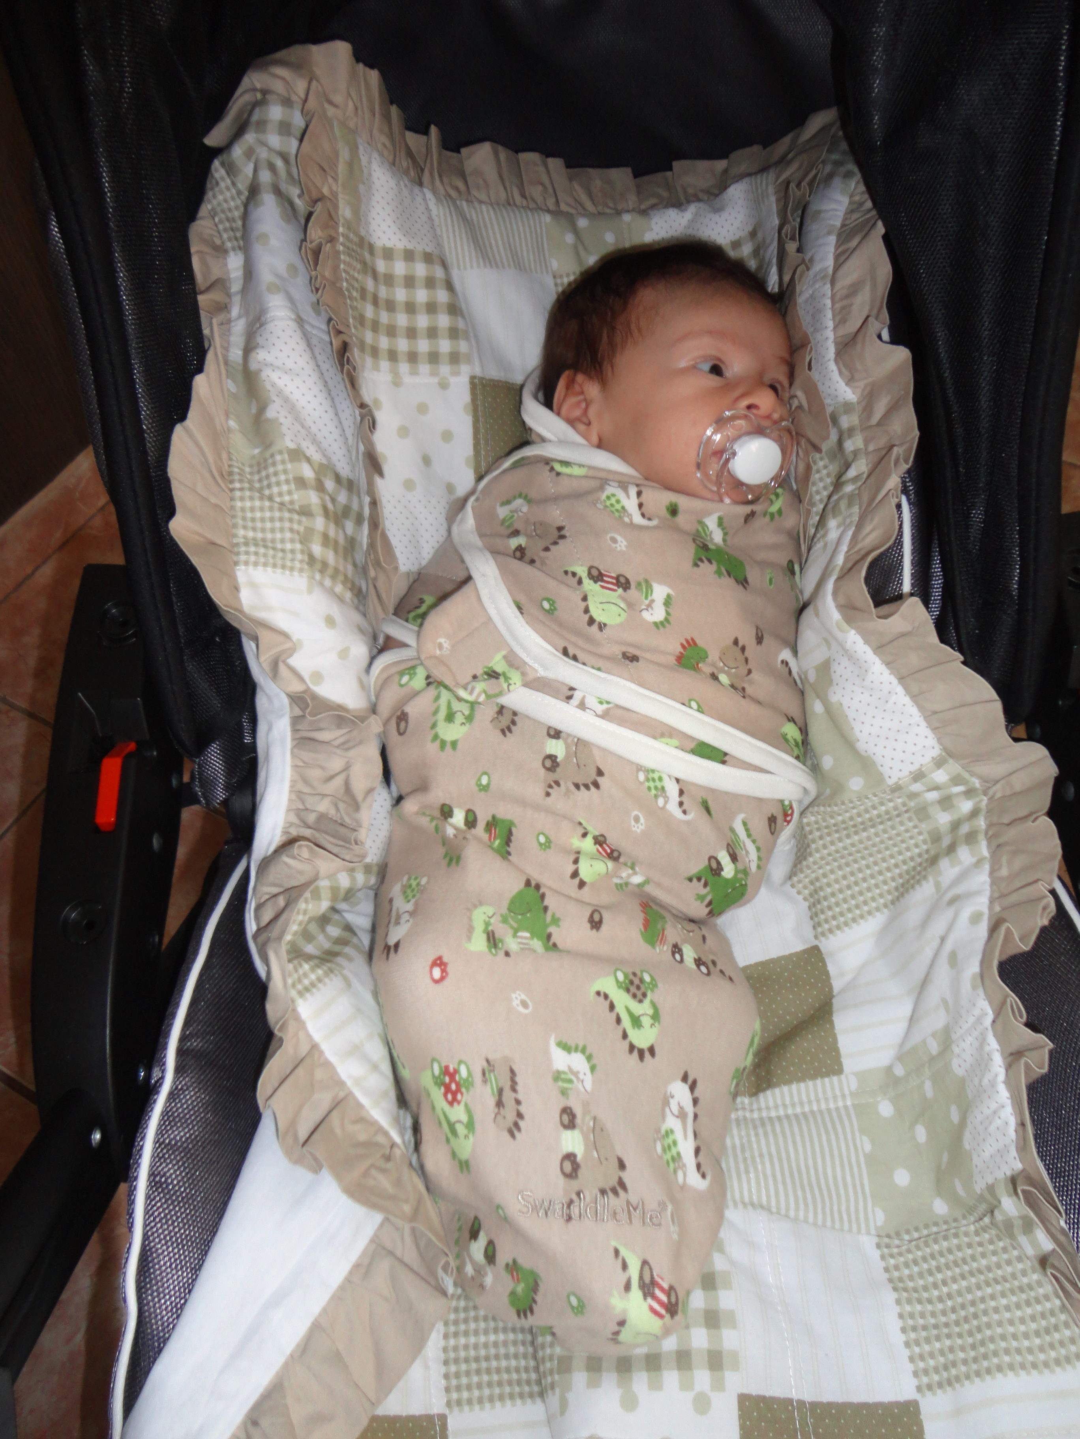 A regra dos 5 s para acalmar o bebê - swaddle